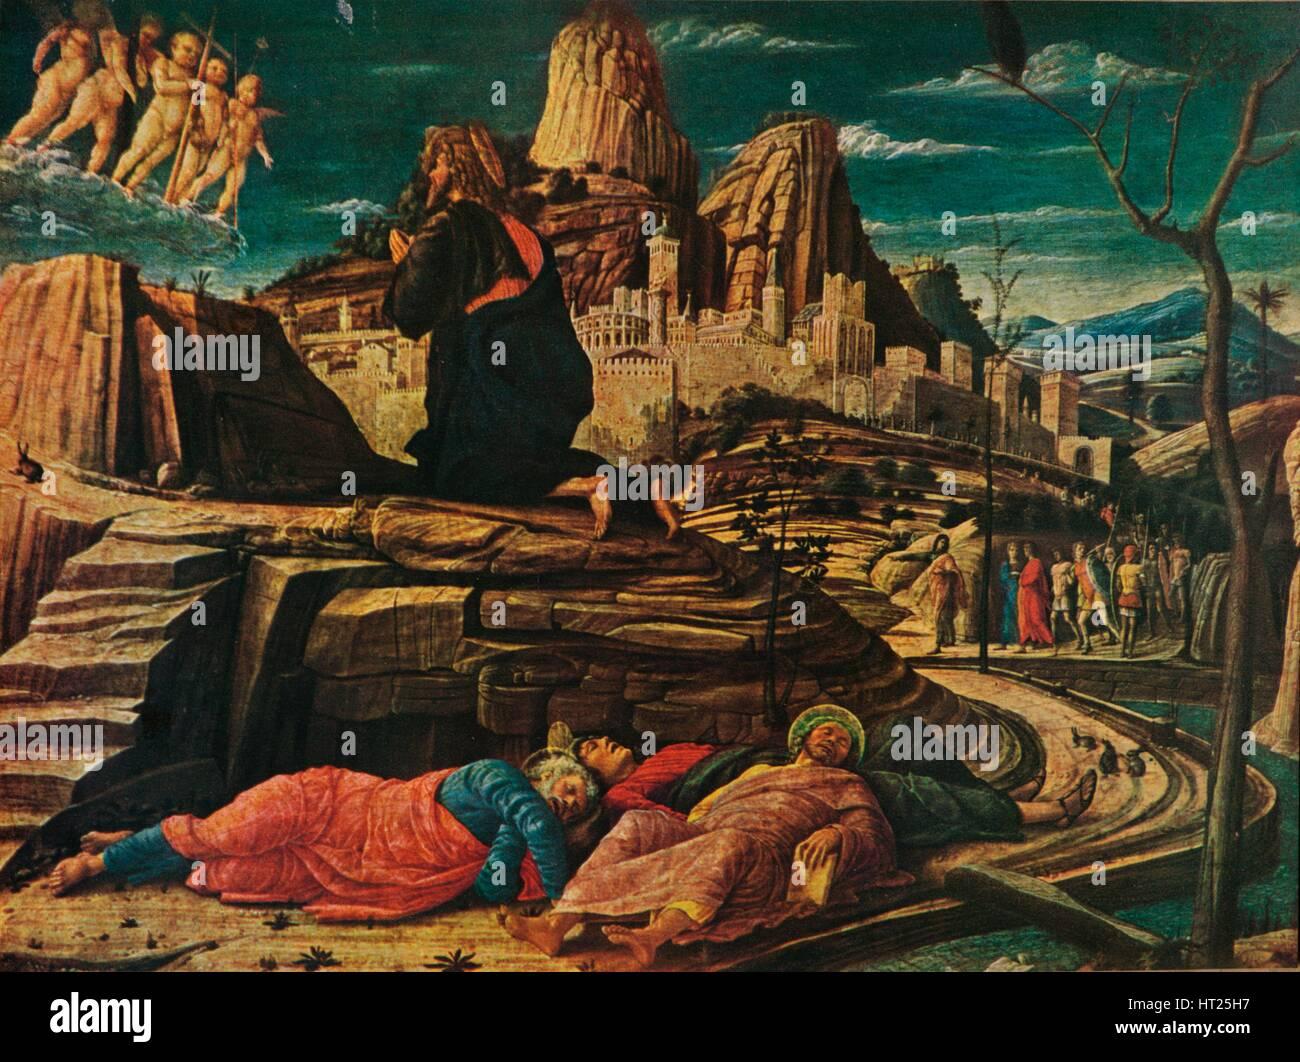 'The Agony in the Garden', c1458, (1909). Artist: Andrea Mantegna. - Stock Image